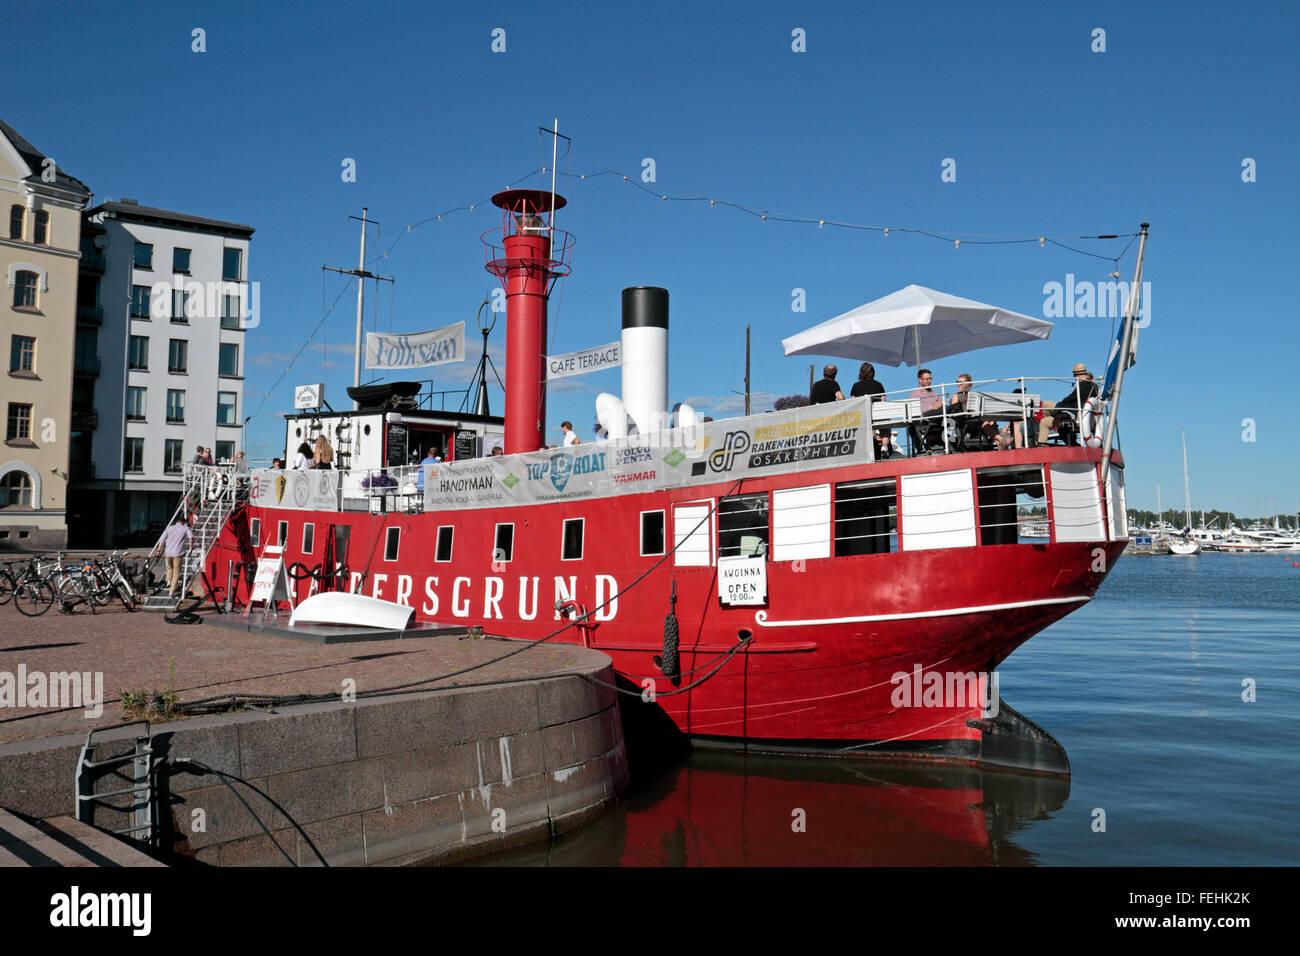 The lightship Relandersgrund cafe restaurant boat, Meritulli Square, Helsinki, Uusimaa, Finland. - Stock Image